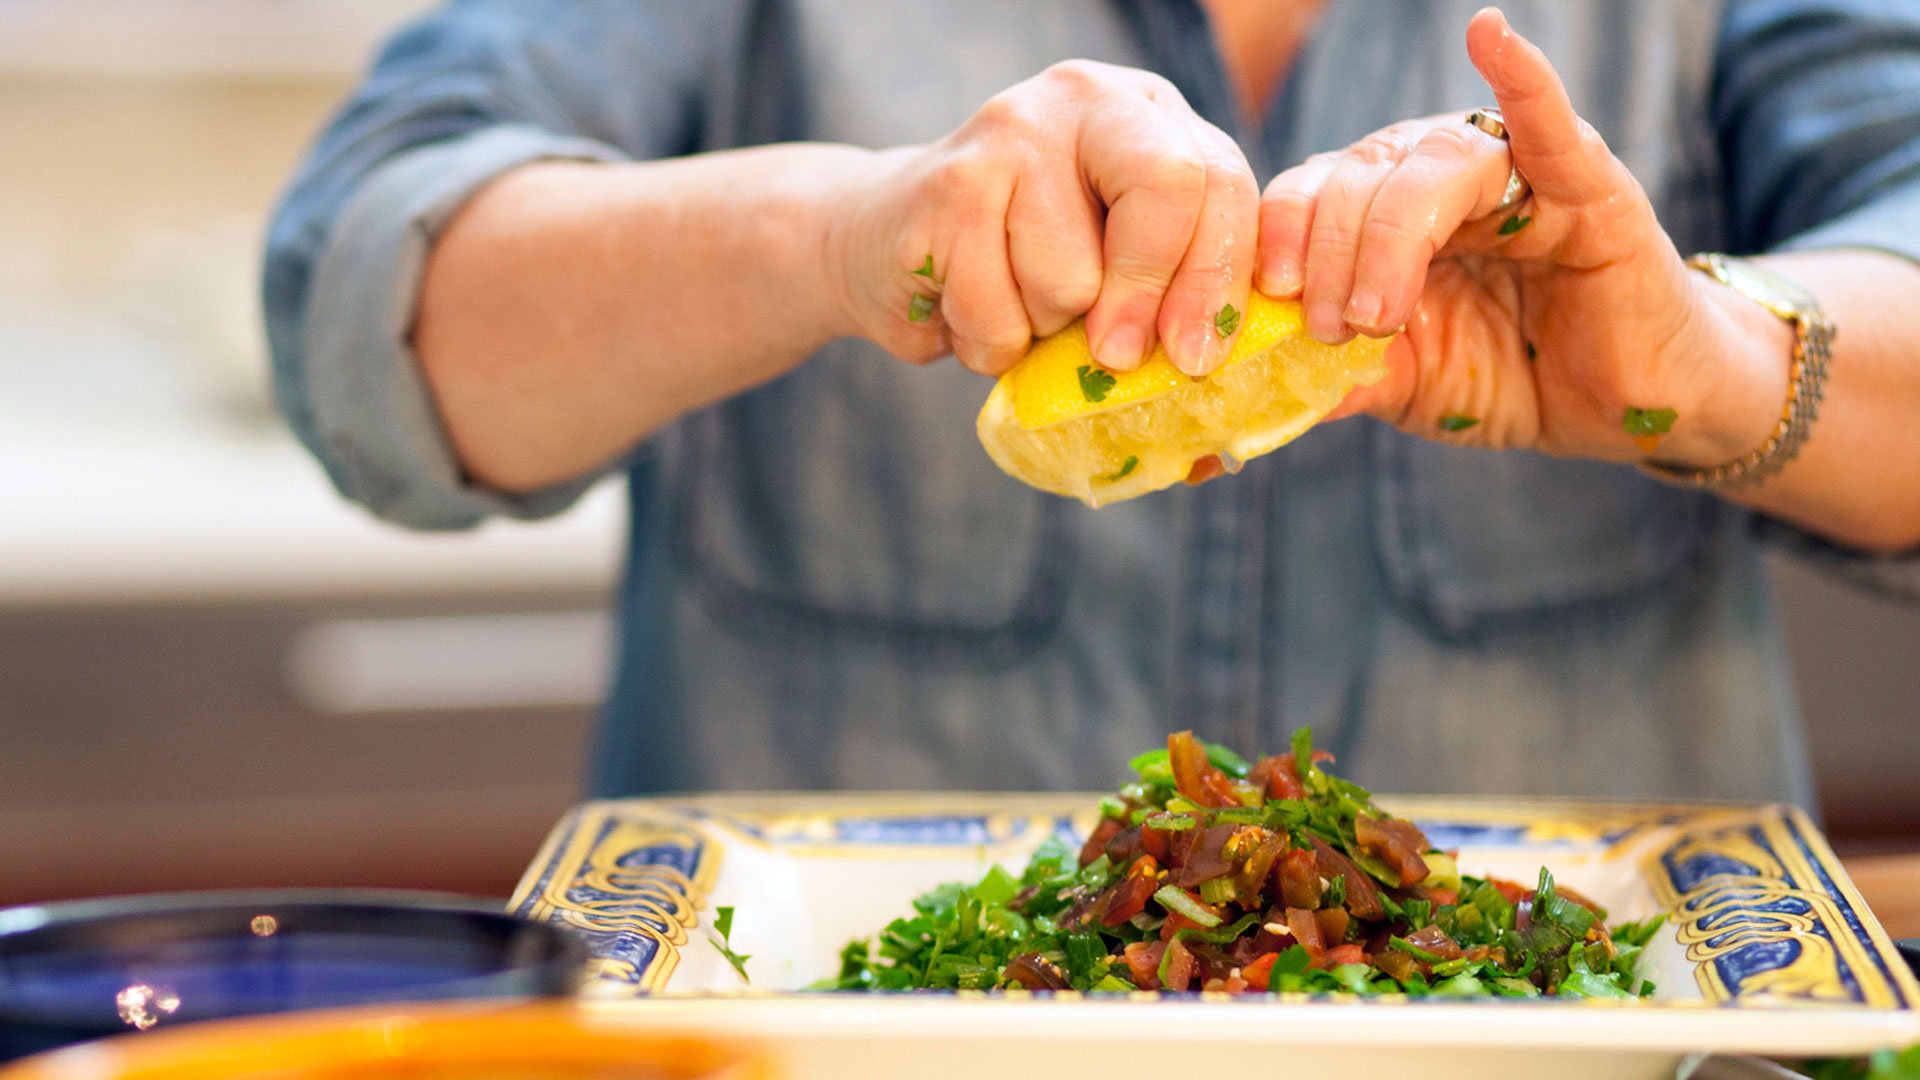 Sara-Prezman-squeezing-lemon-juice-to-her-Tabbouleh-Salad-recipe-Foodadit